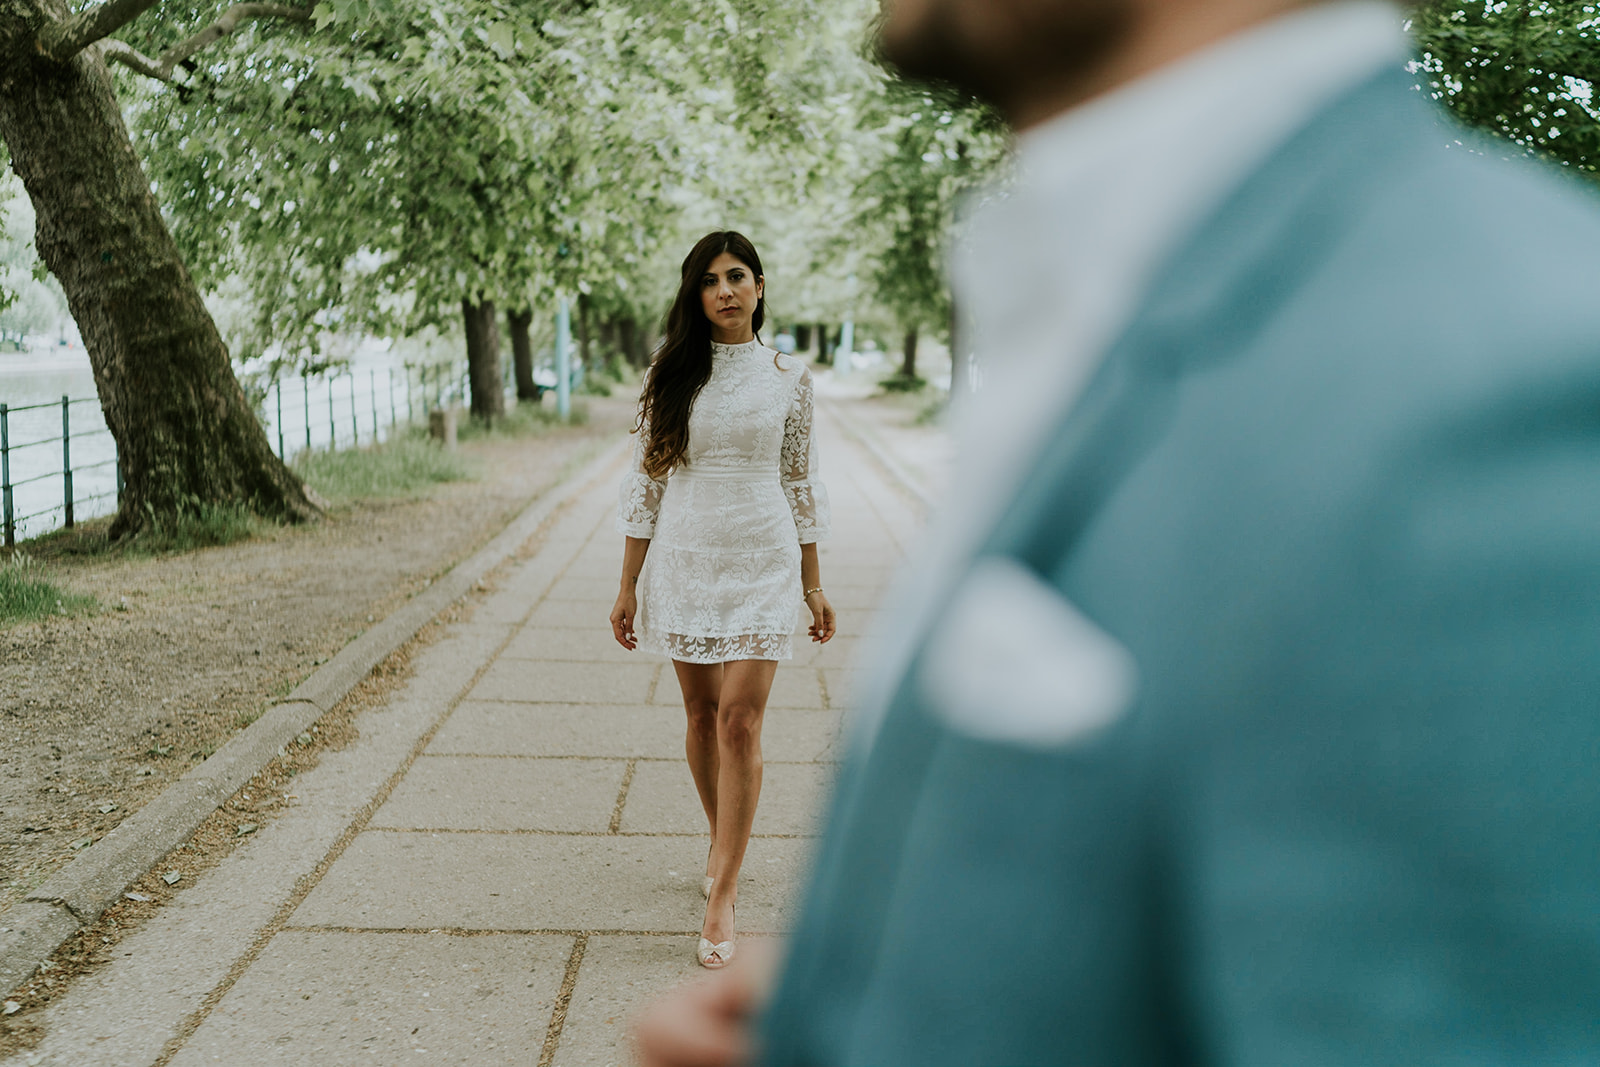 Sabri-photographe-sayde-_-george-wedding-274.jpg